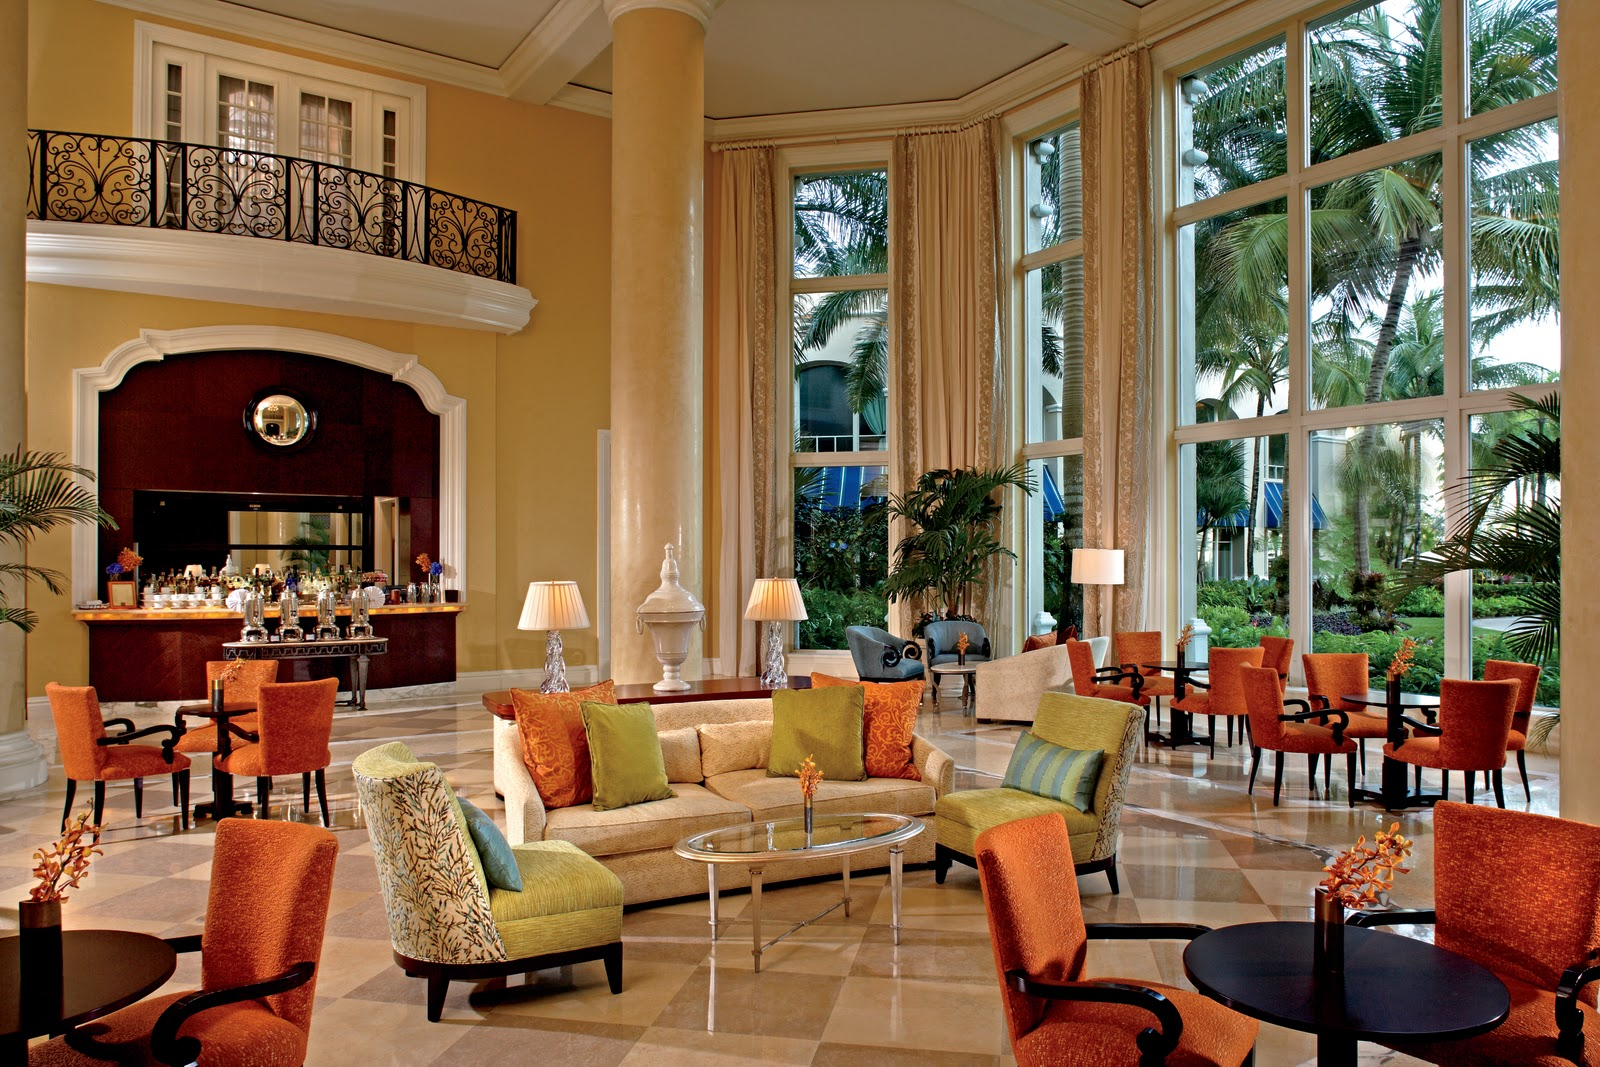 The ritz-carlton san juan hotel spa and casino casino beach hotel